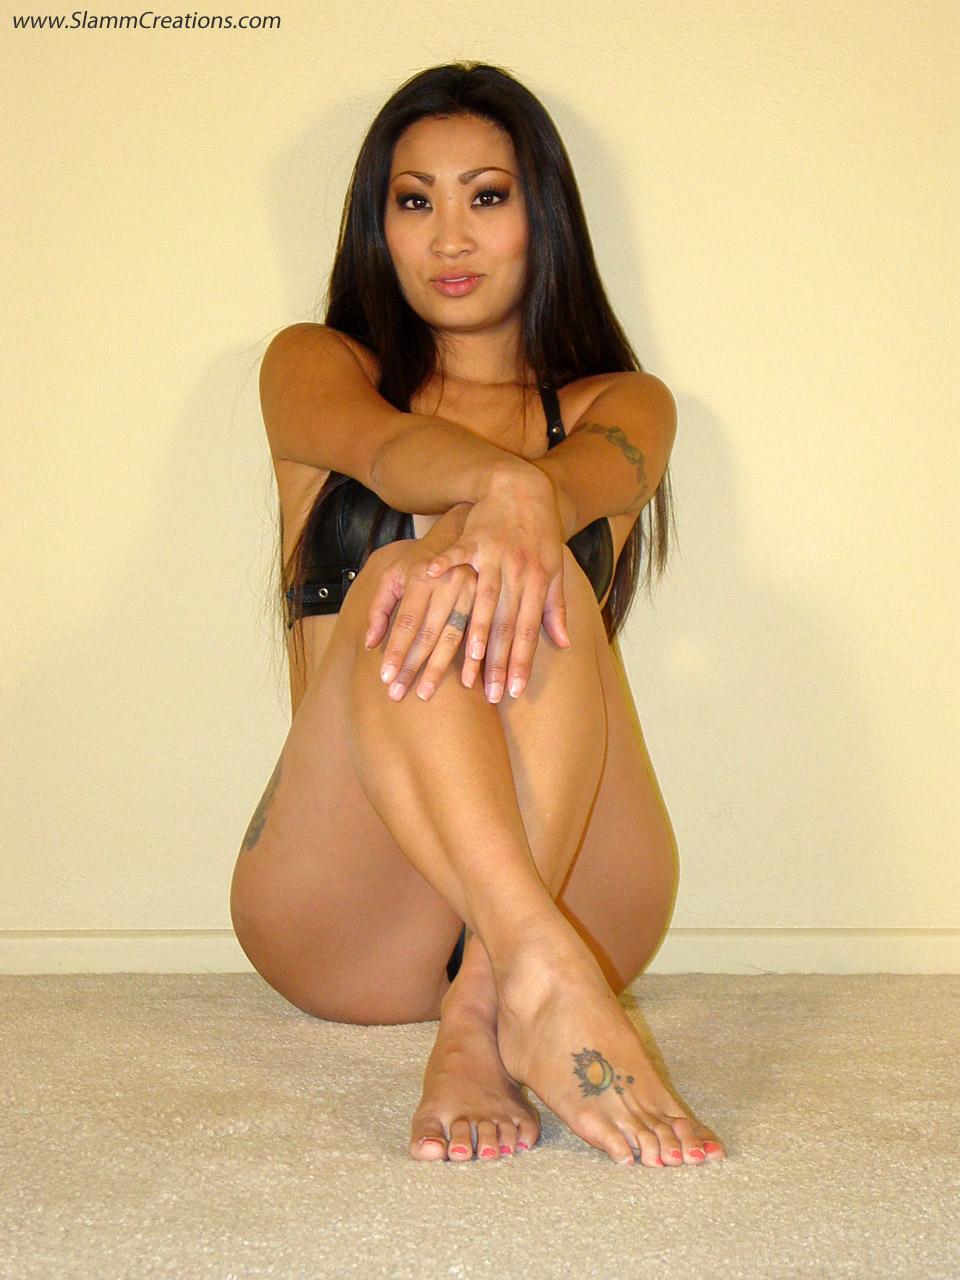 Nicole Oring - Black Leather Bikini by slamm345